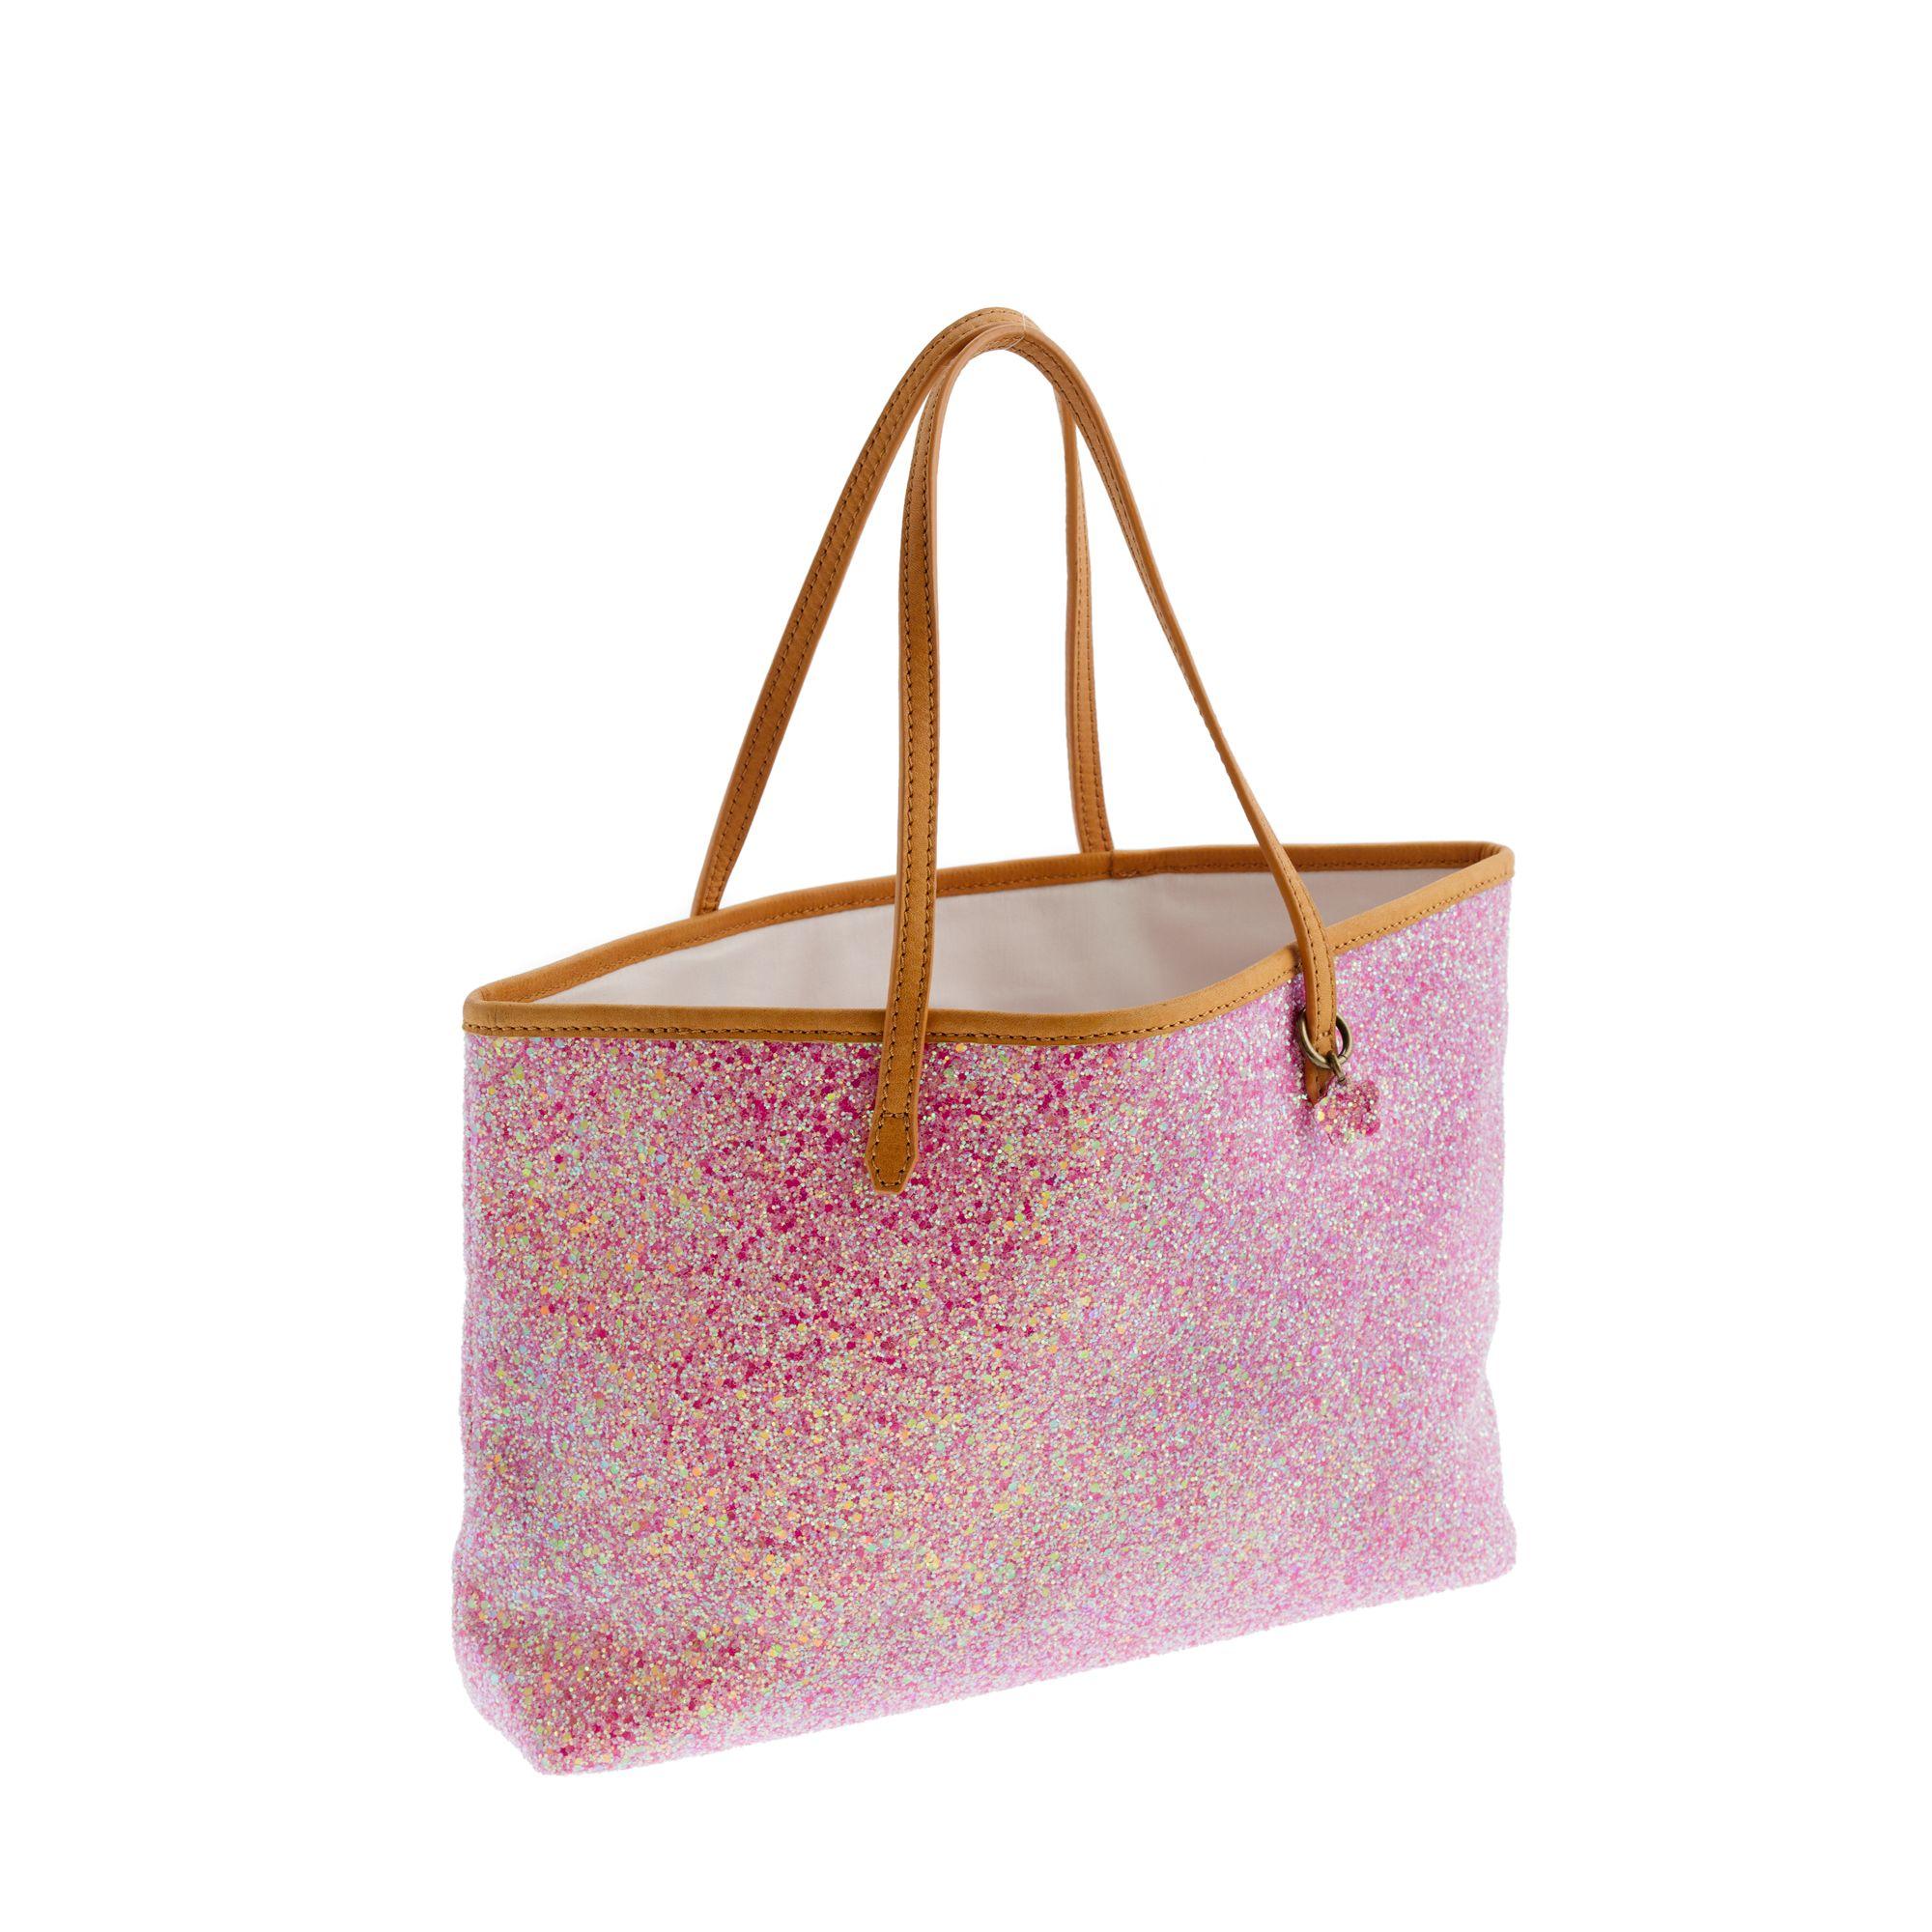 Pink glittered shoulder bag Ztd4xRsQXT